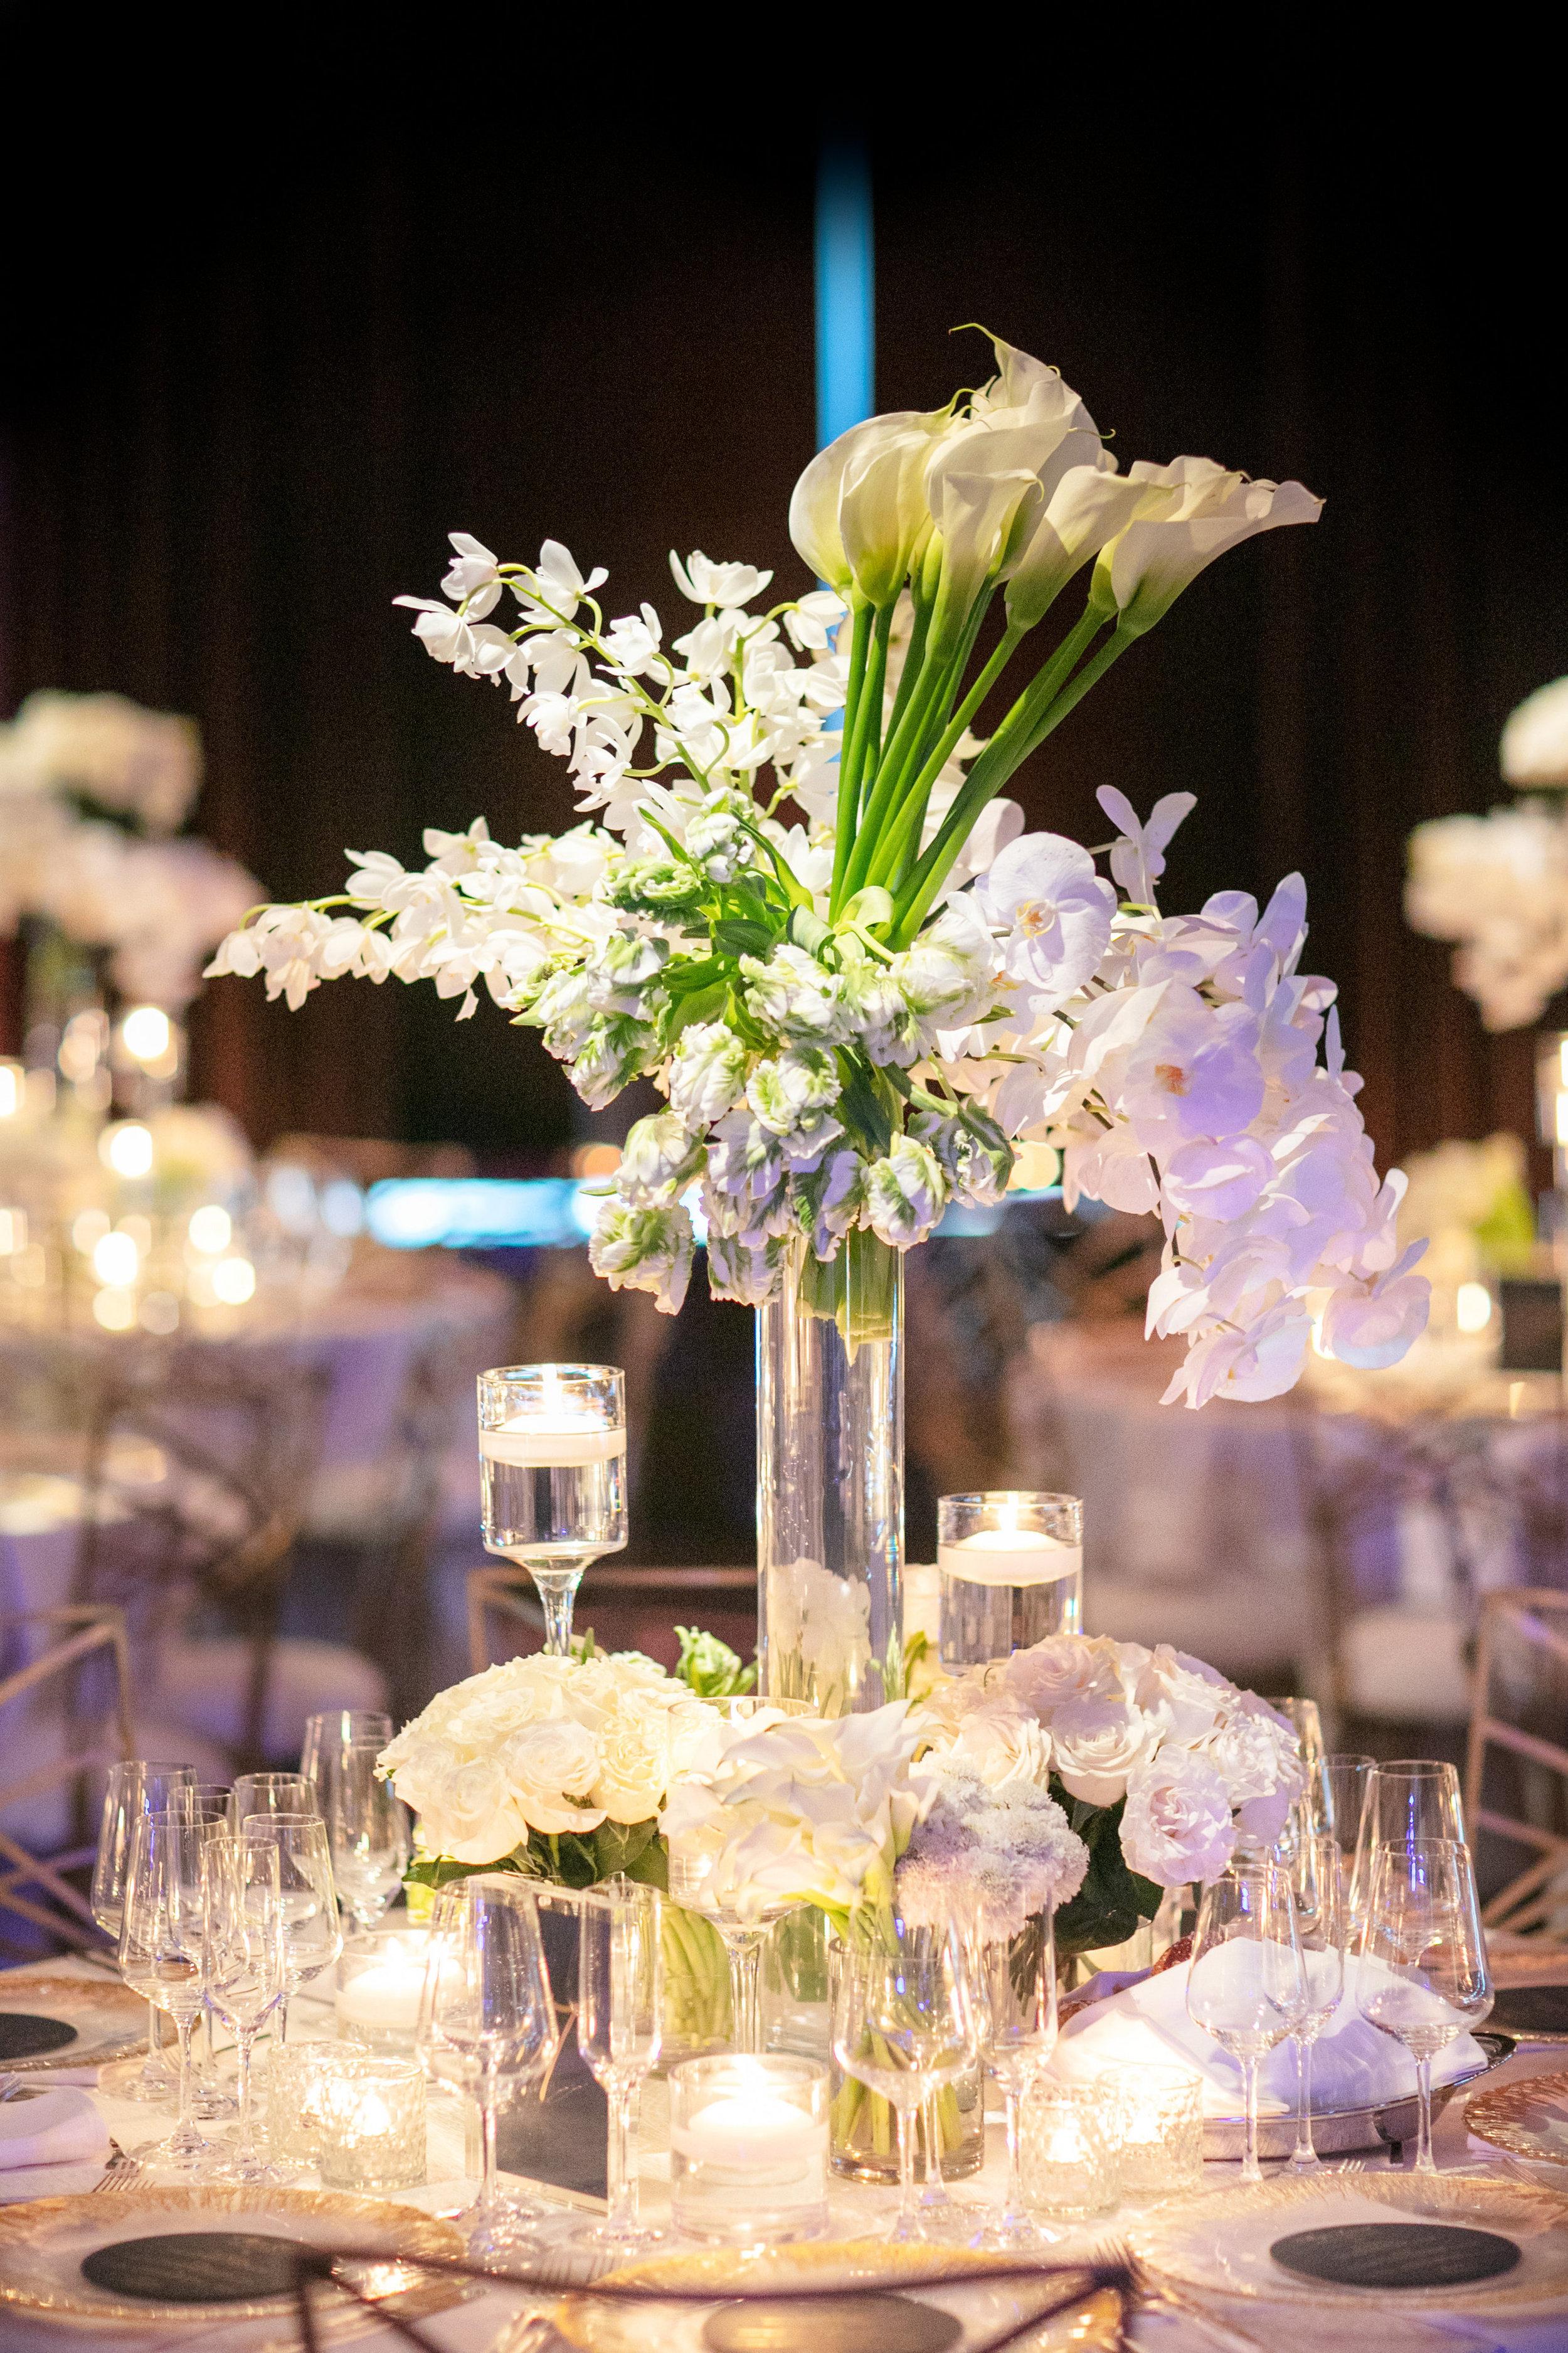 Andrea-Freeman-Events-NY-Wedding-Planner-Mandarin-Oriental-Wedding-10.jpg